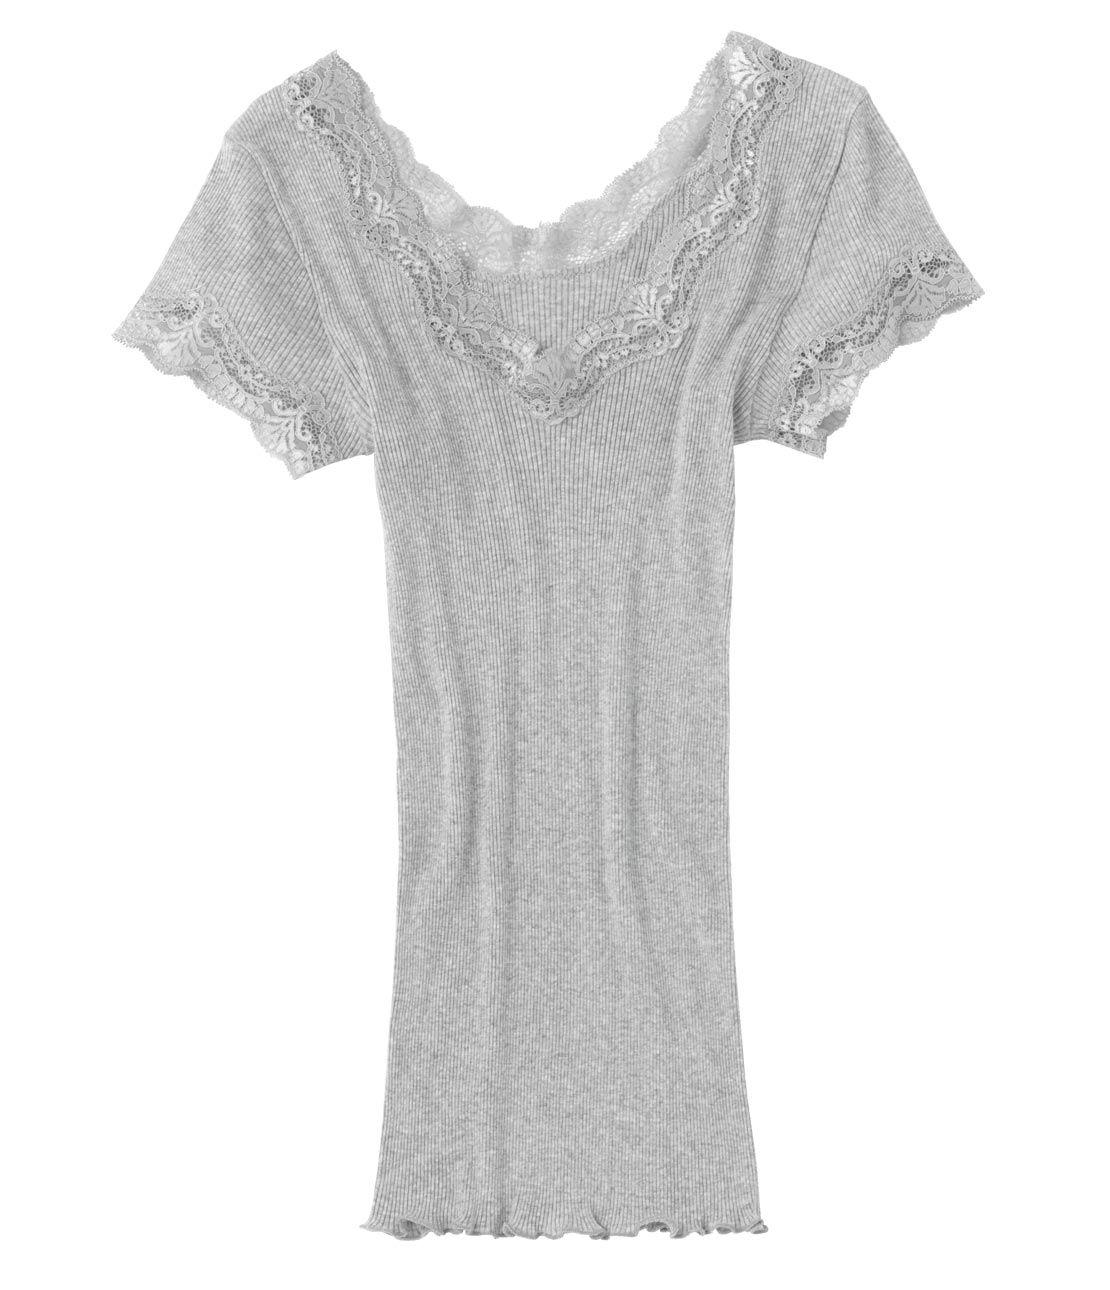 Rayon cotton rib short sleeve